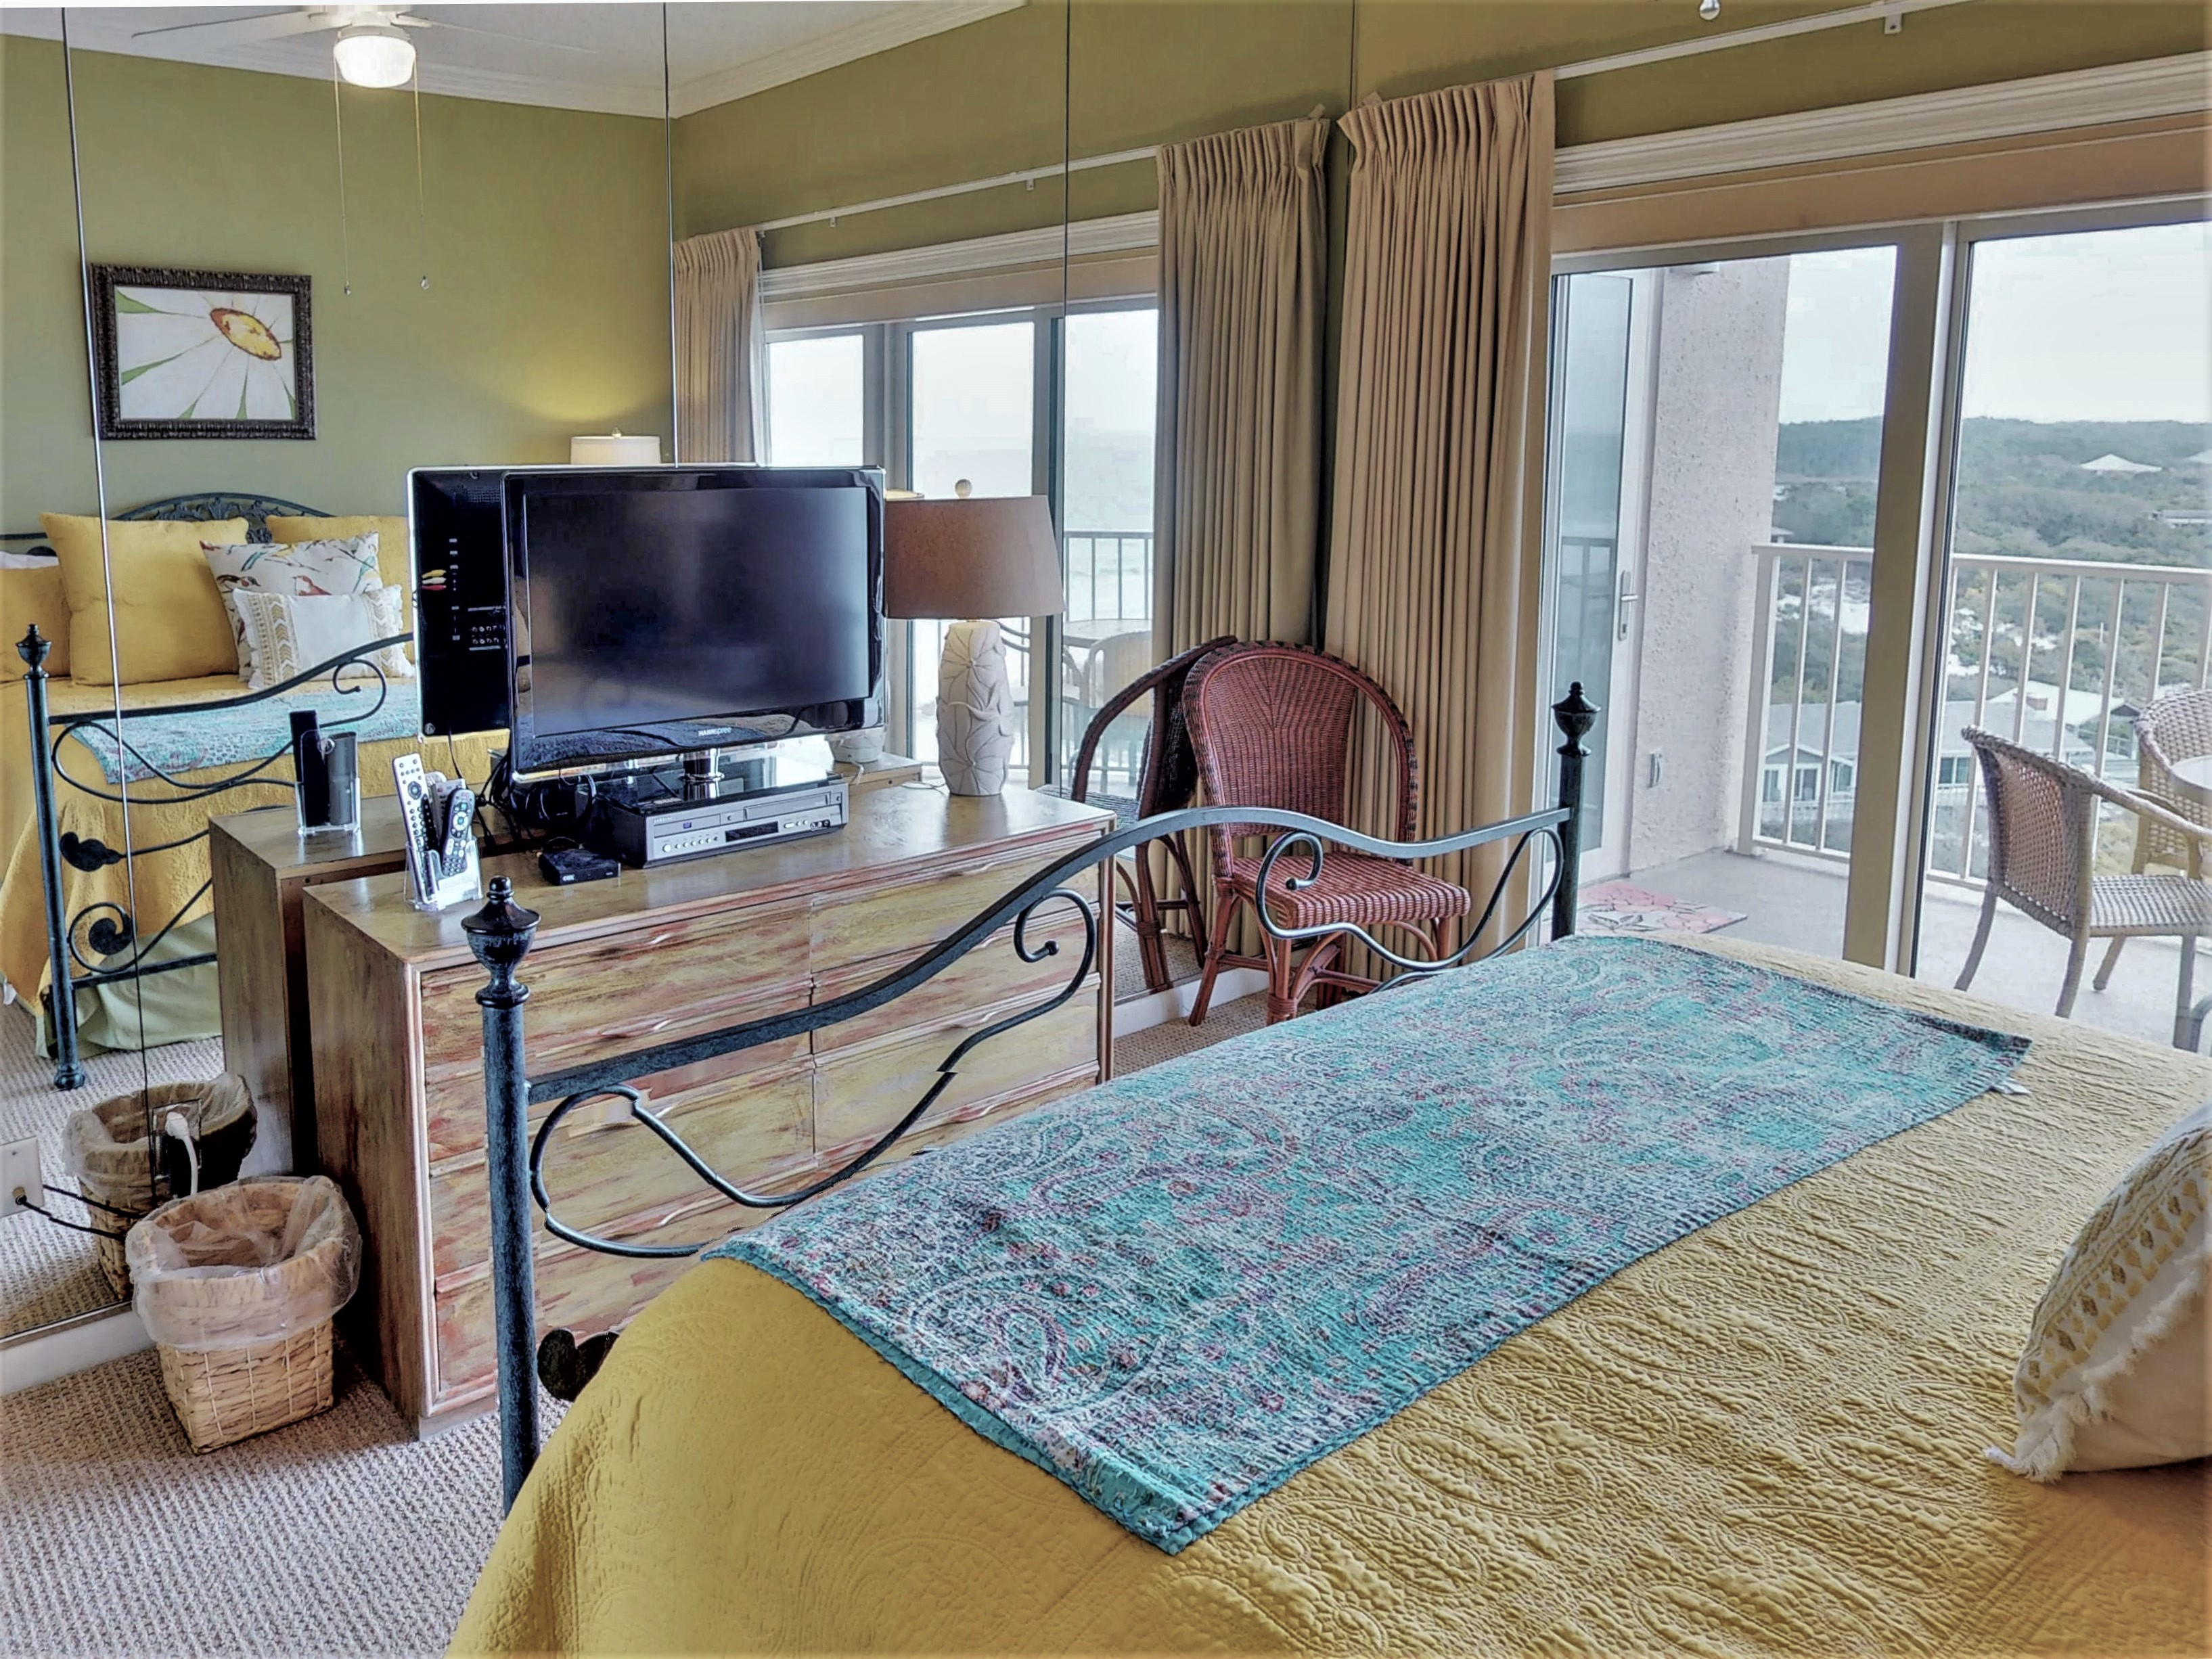 905 Tops'l Beach Manor Condo rental in TOPS'L Beach Manor  in Destin Florida - #12